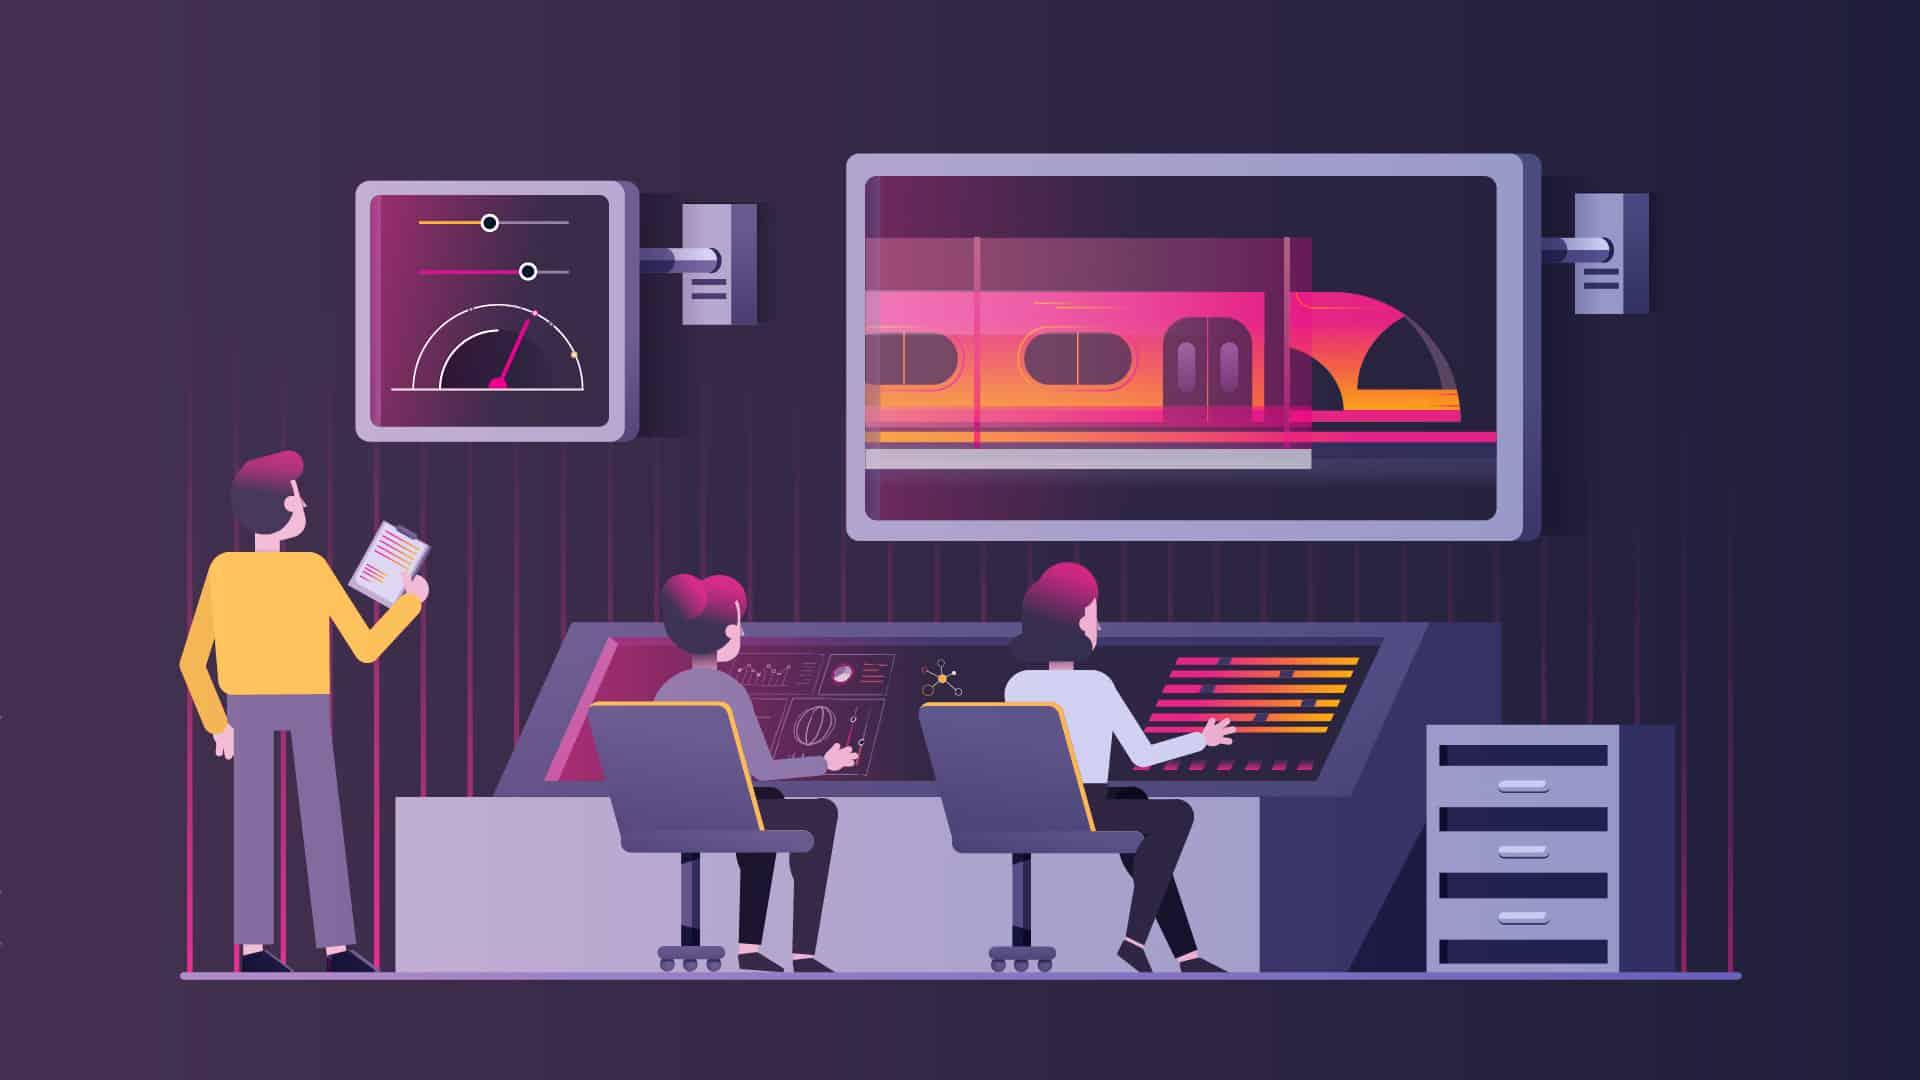 AnKa Studio סטודיו אנקה - סטודיו להפקת סרטי מוצר בוידאו ואנימציה